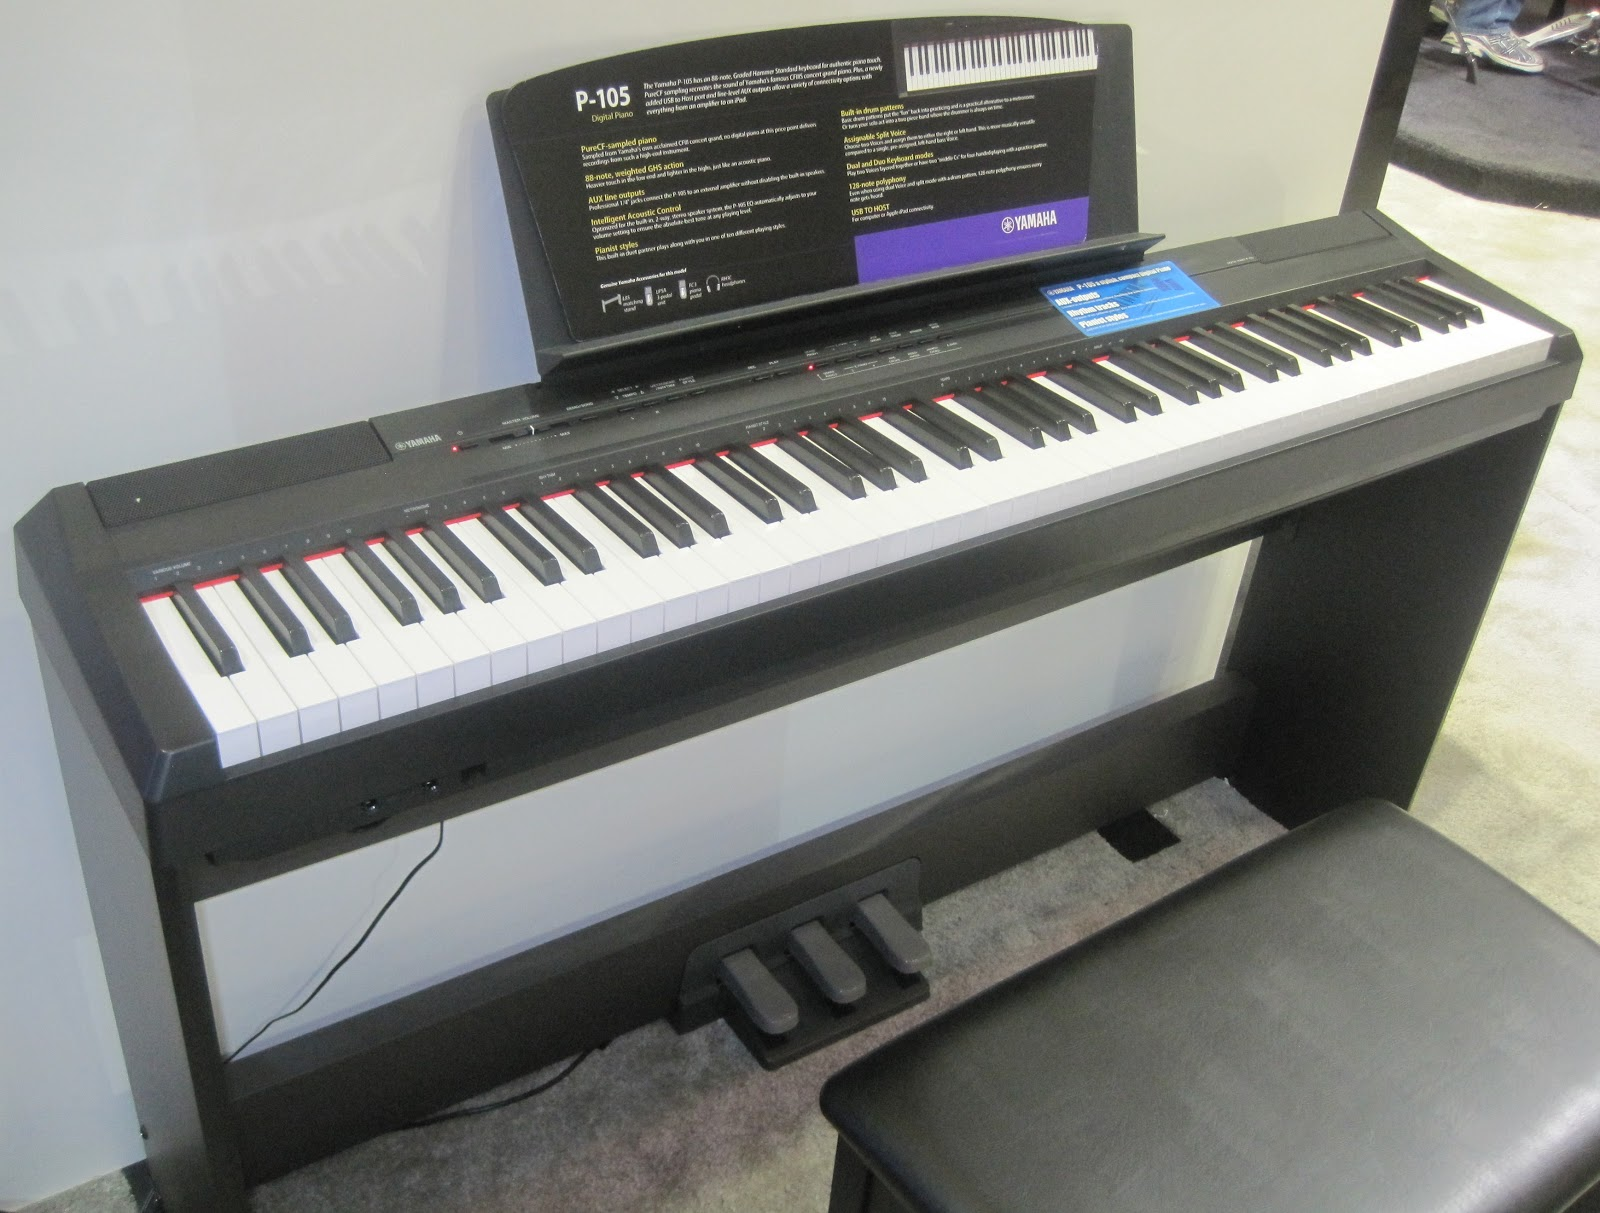 Connect-a-Yamaha-Keyboard-to-a-Computer-Step-5-Version-2 P105 Yamaha